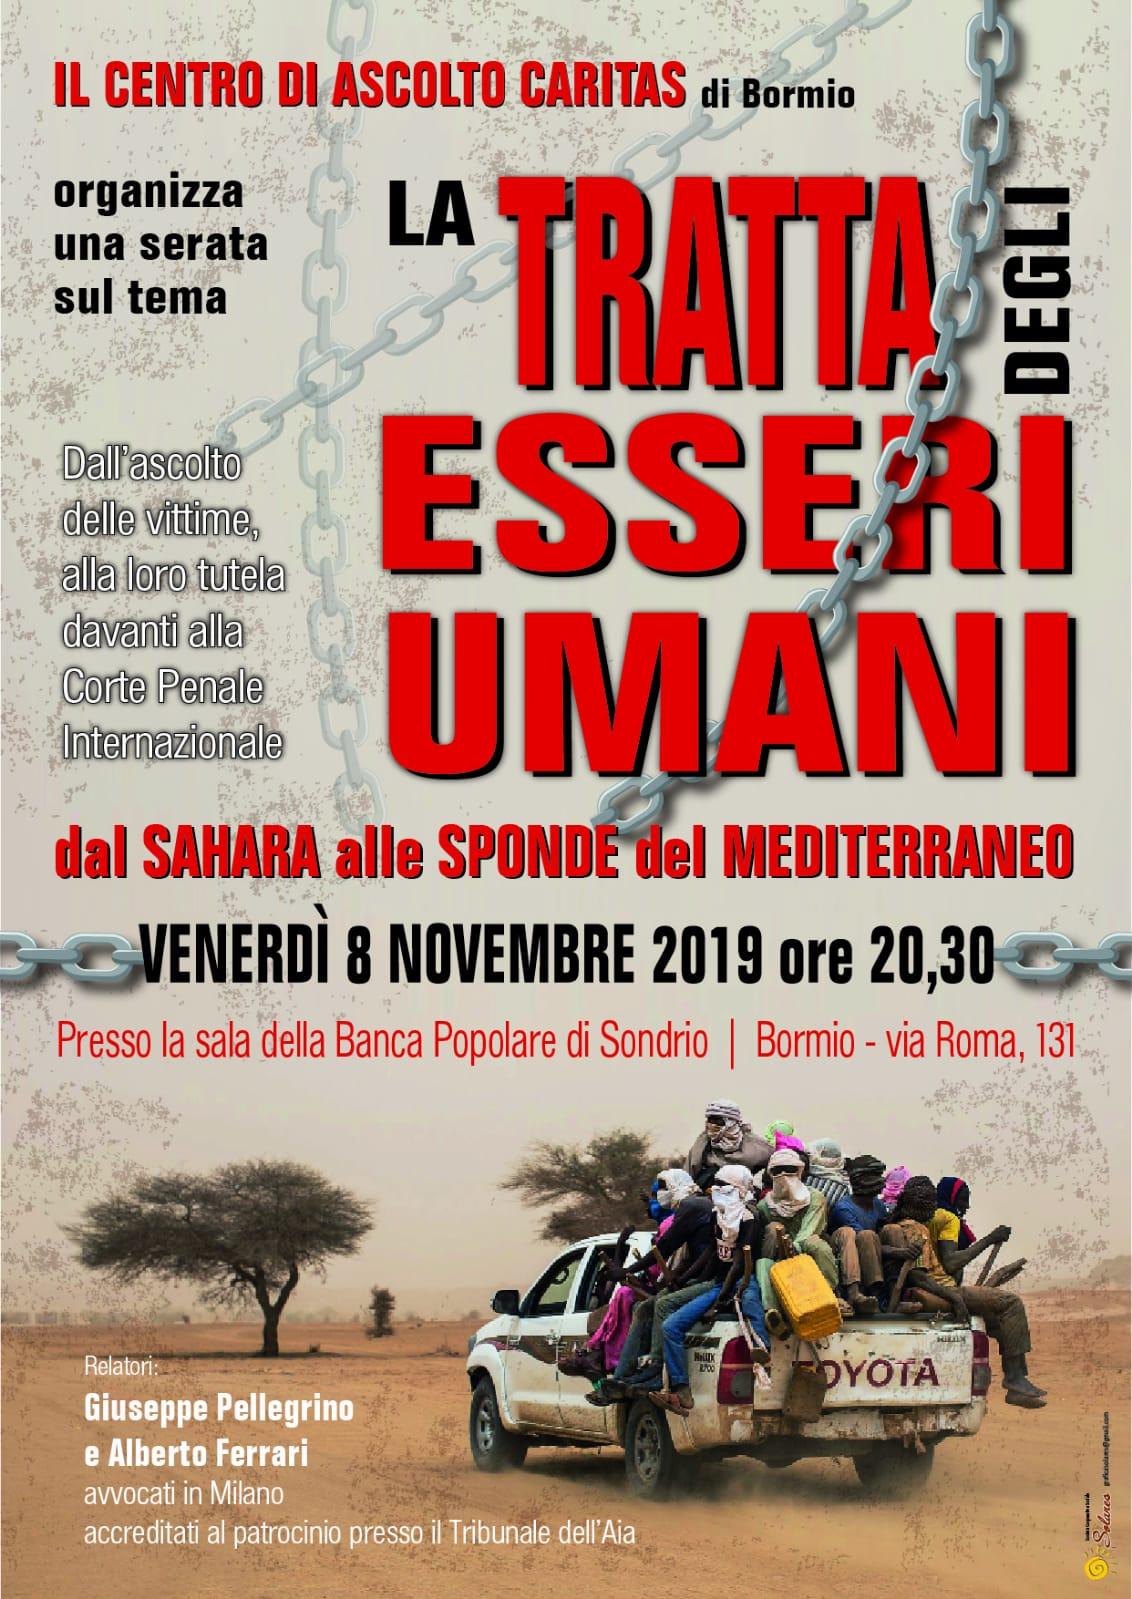 Bormio, 8 novembre 2019, h. 20.30